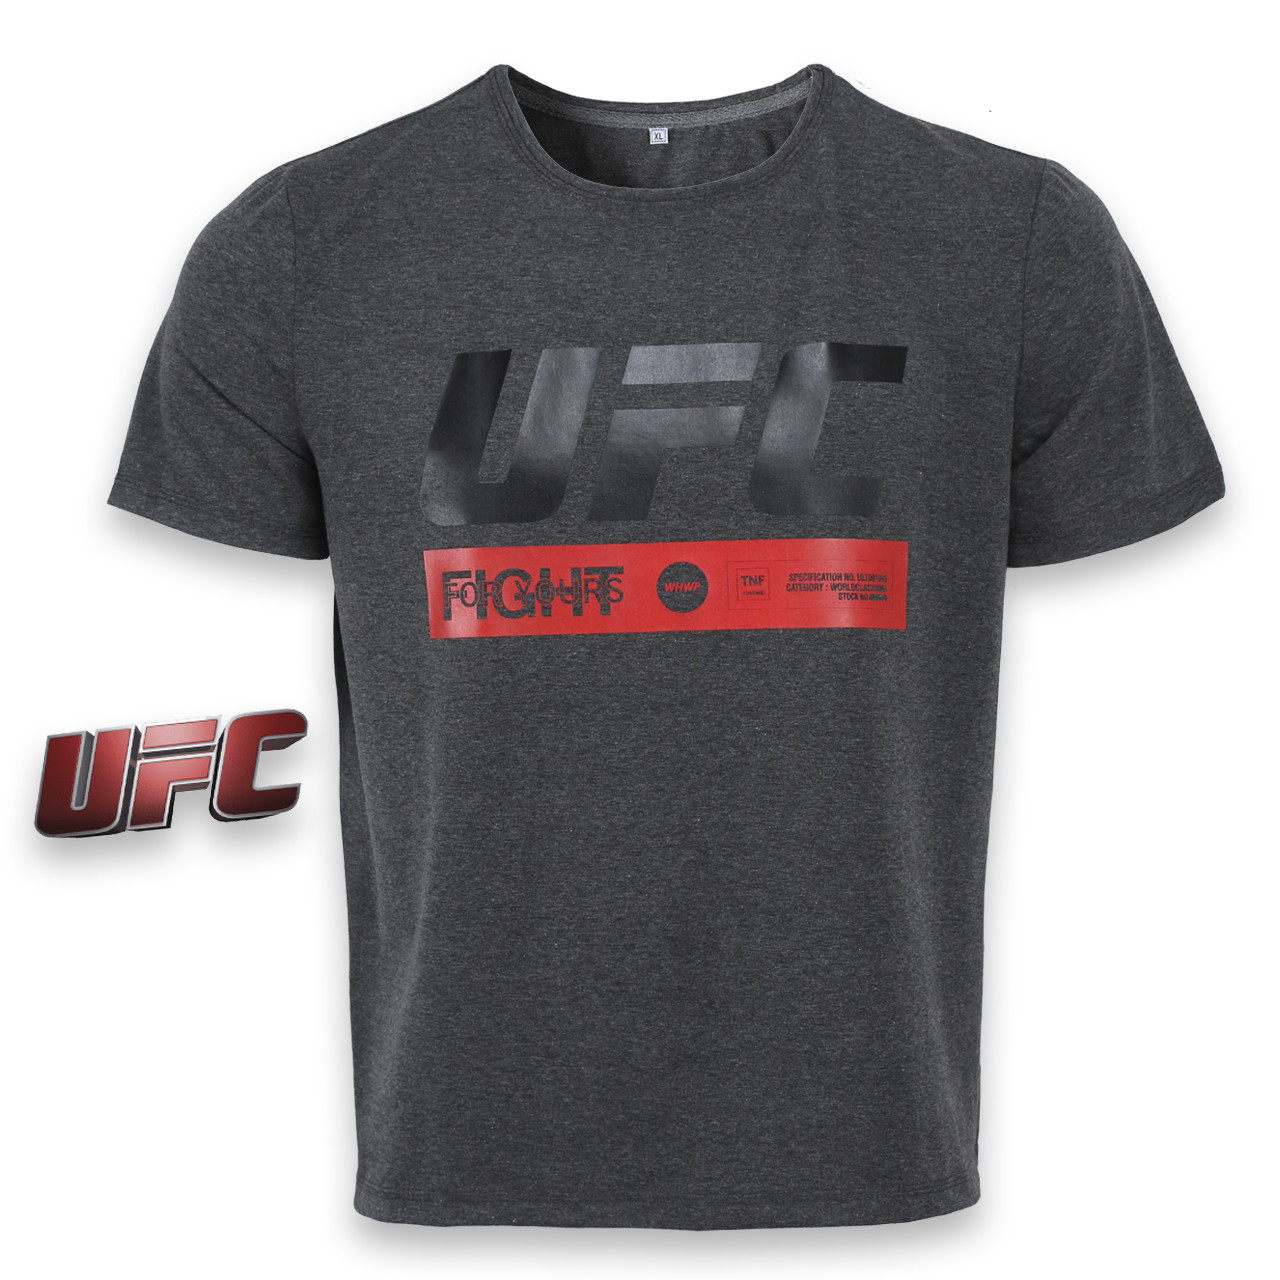 "Футболка спортивная антрацит UFC ""FIGHT"" Ф-10 ANTR L(Р) 20-914-020"